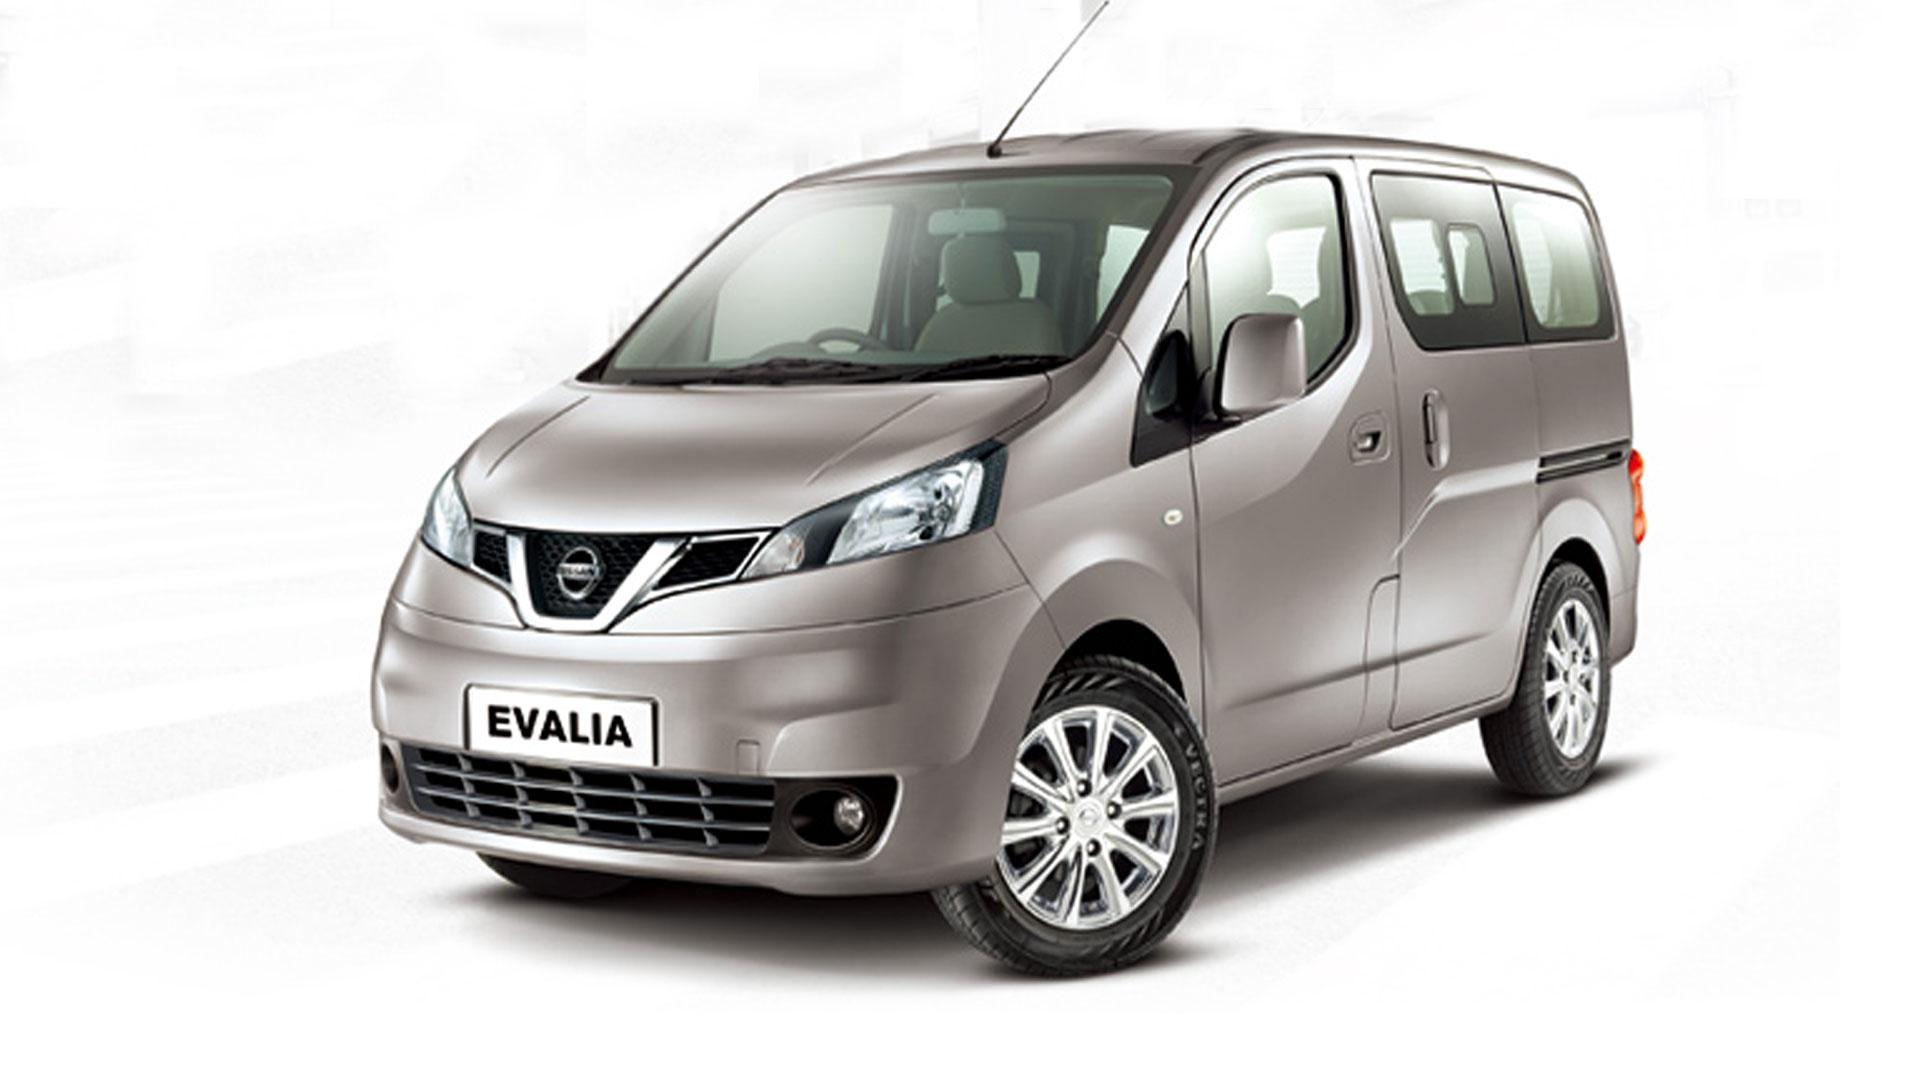 Nissan Evalia 2014 XE